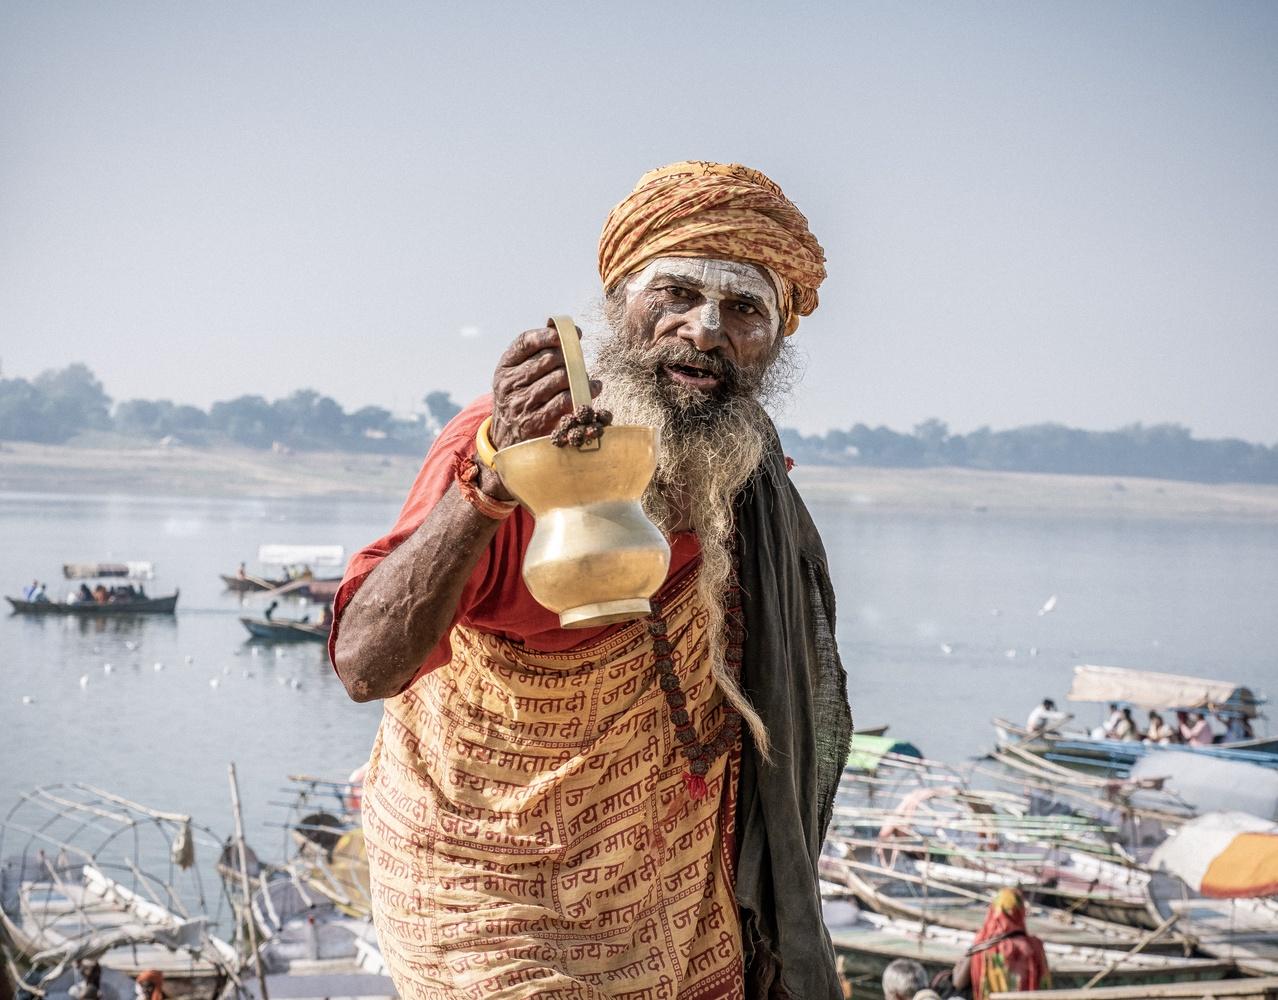 Sadhu in Triveni Sangam by Raul Farfan